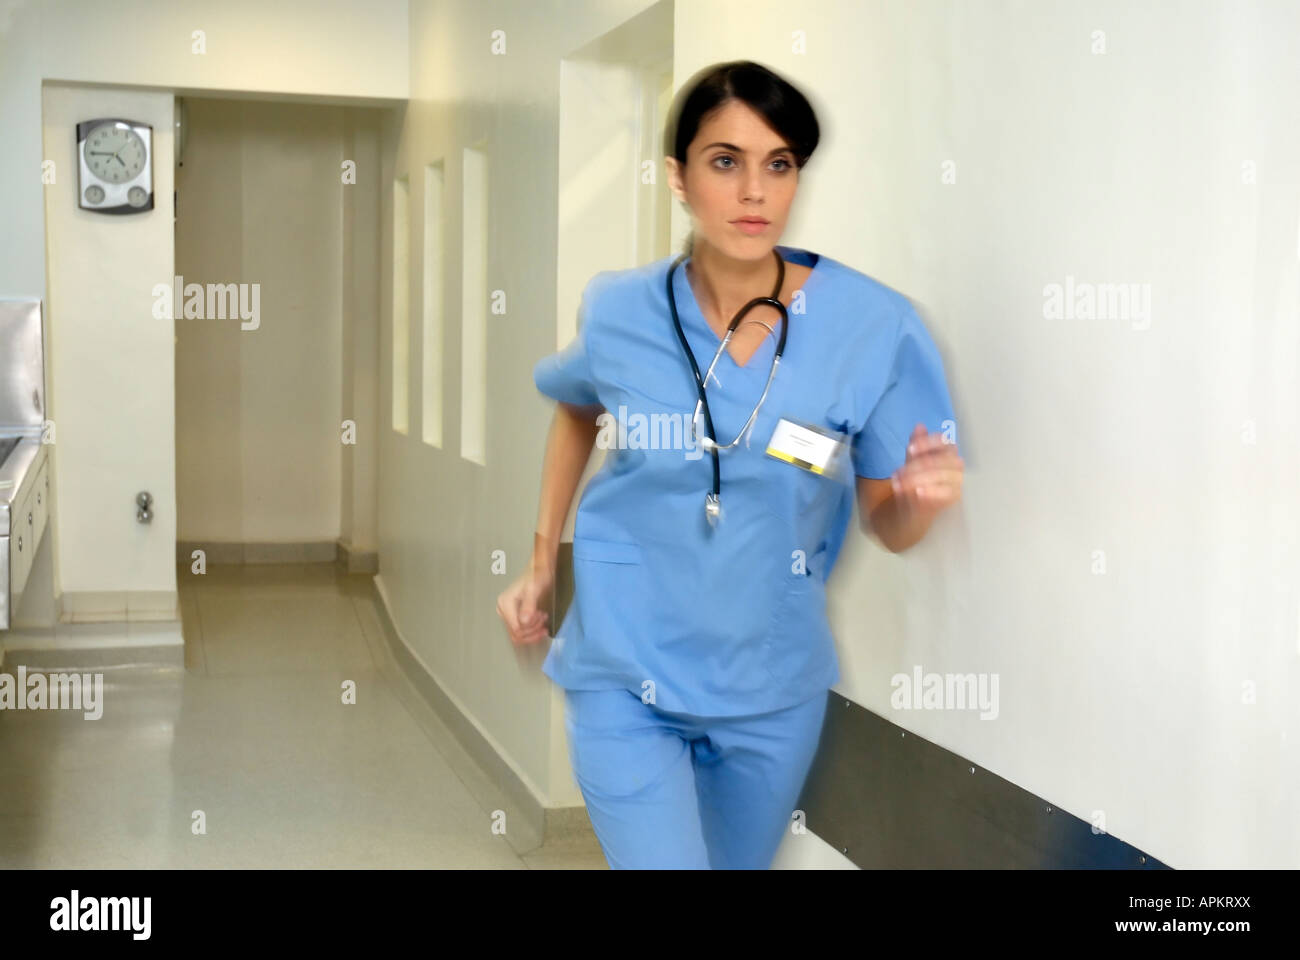 Watch Busy Doctor Hurried Nurse video